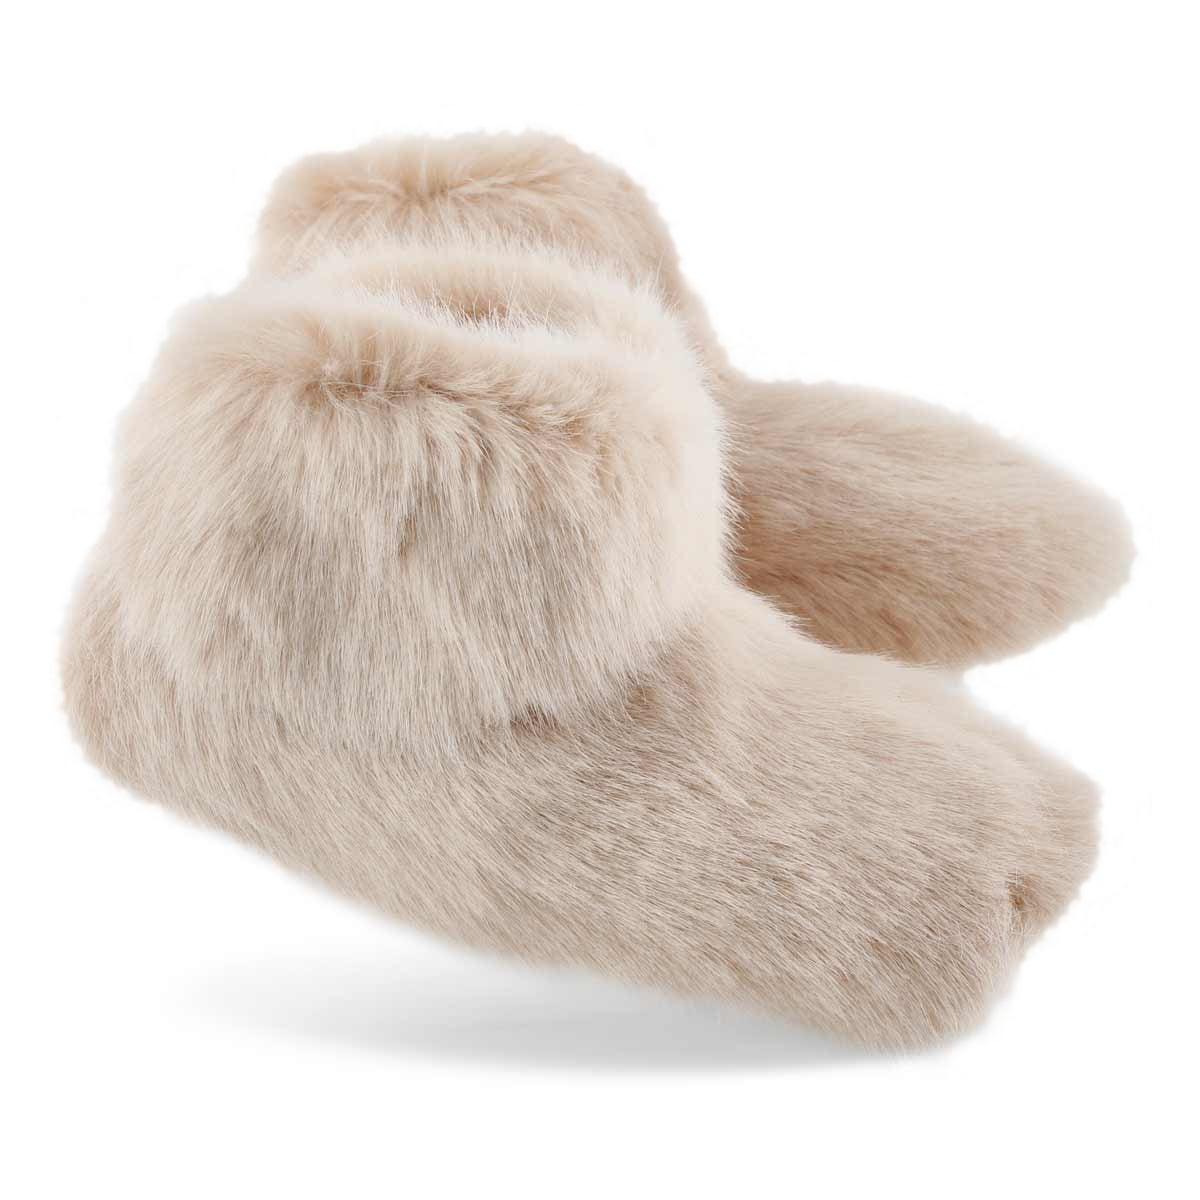 Lds Amary quartz bootie slipper